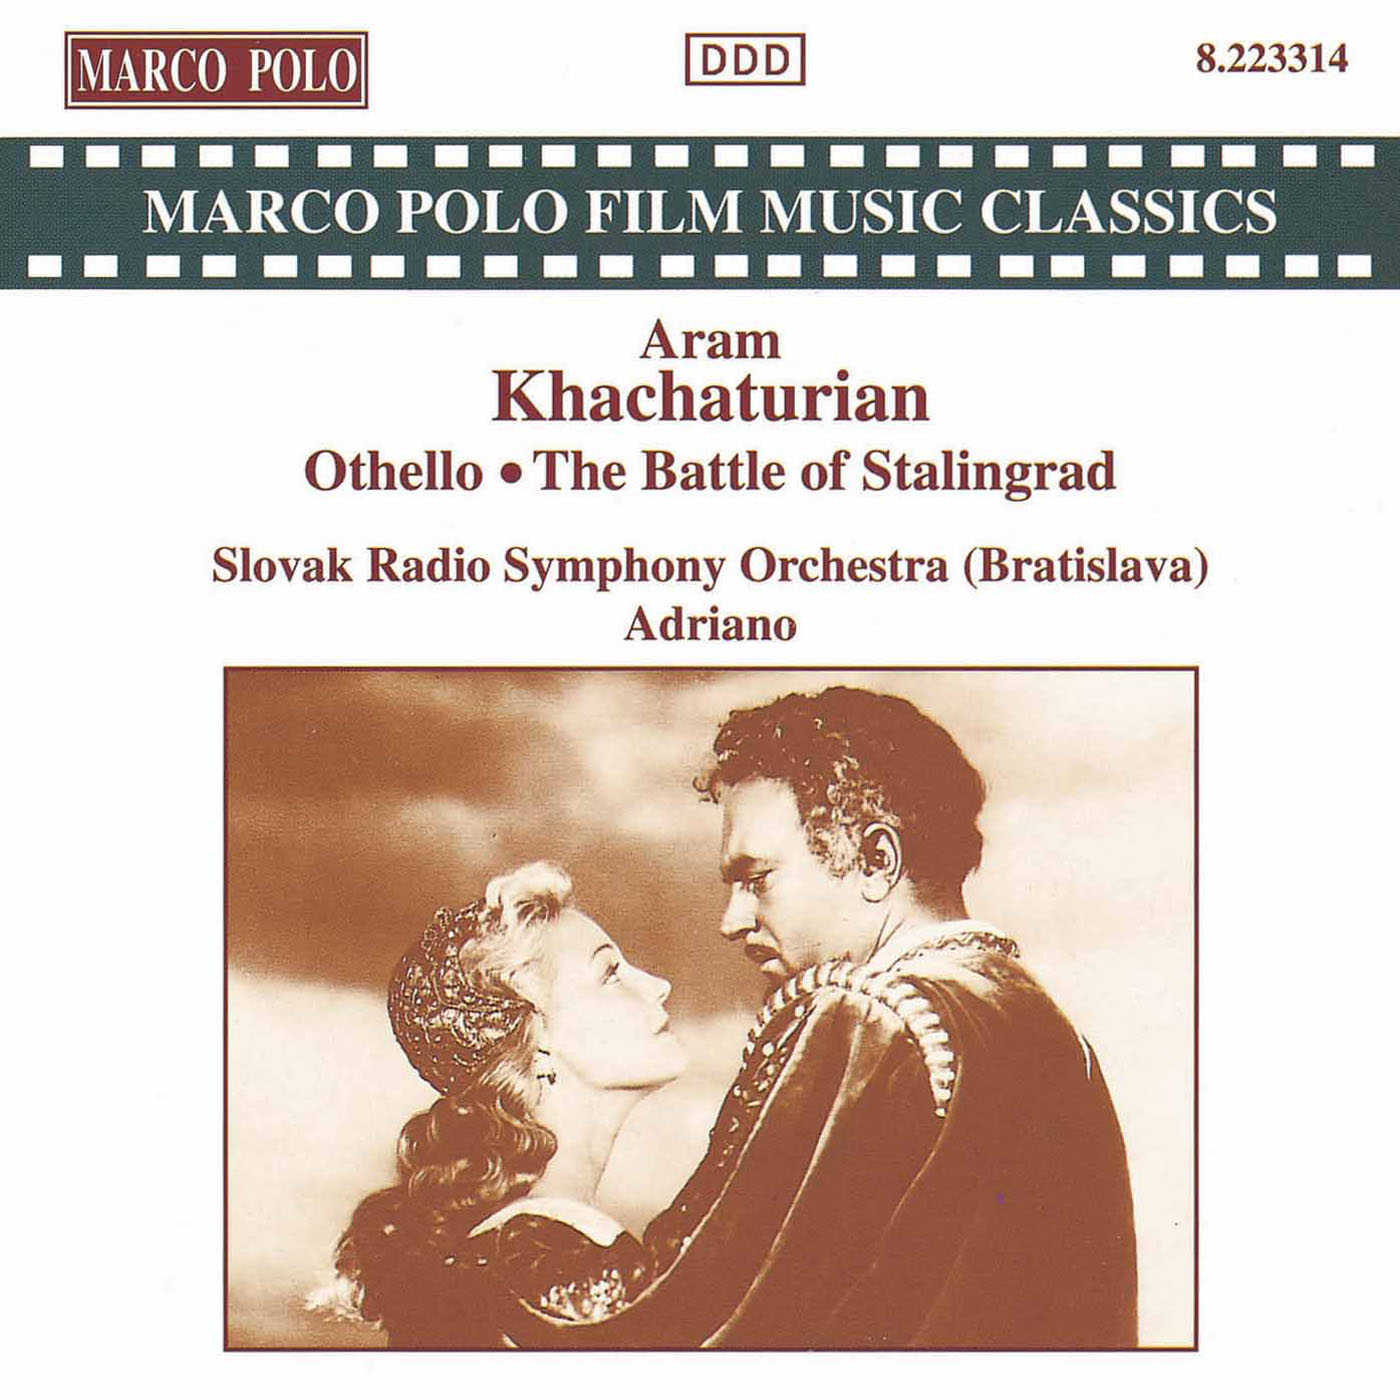 Khachaturian: Othello - The Battle of Stalingrad